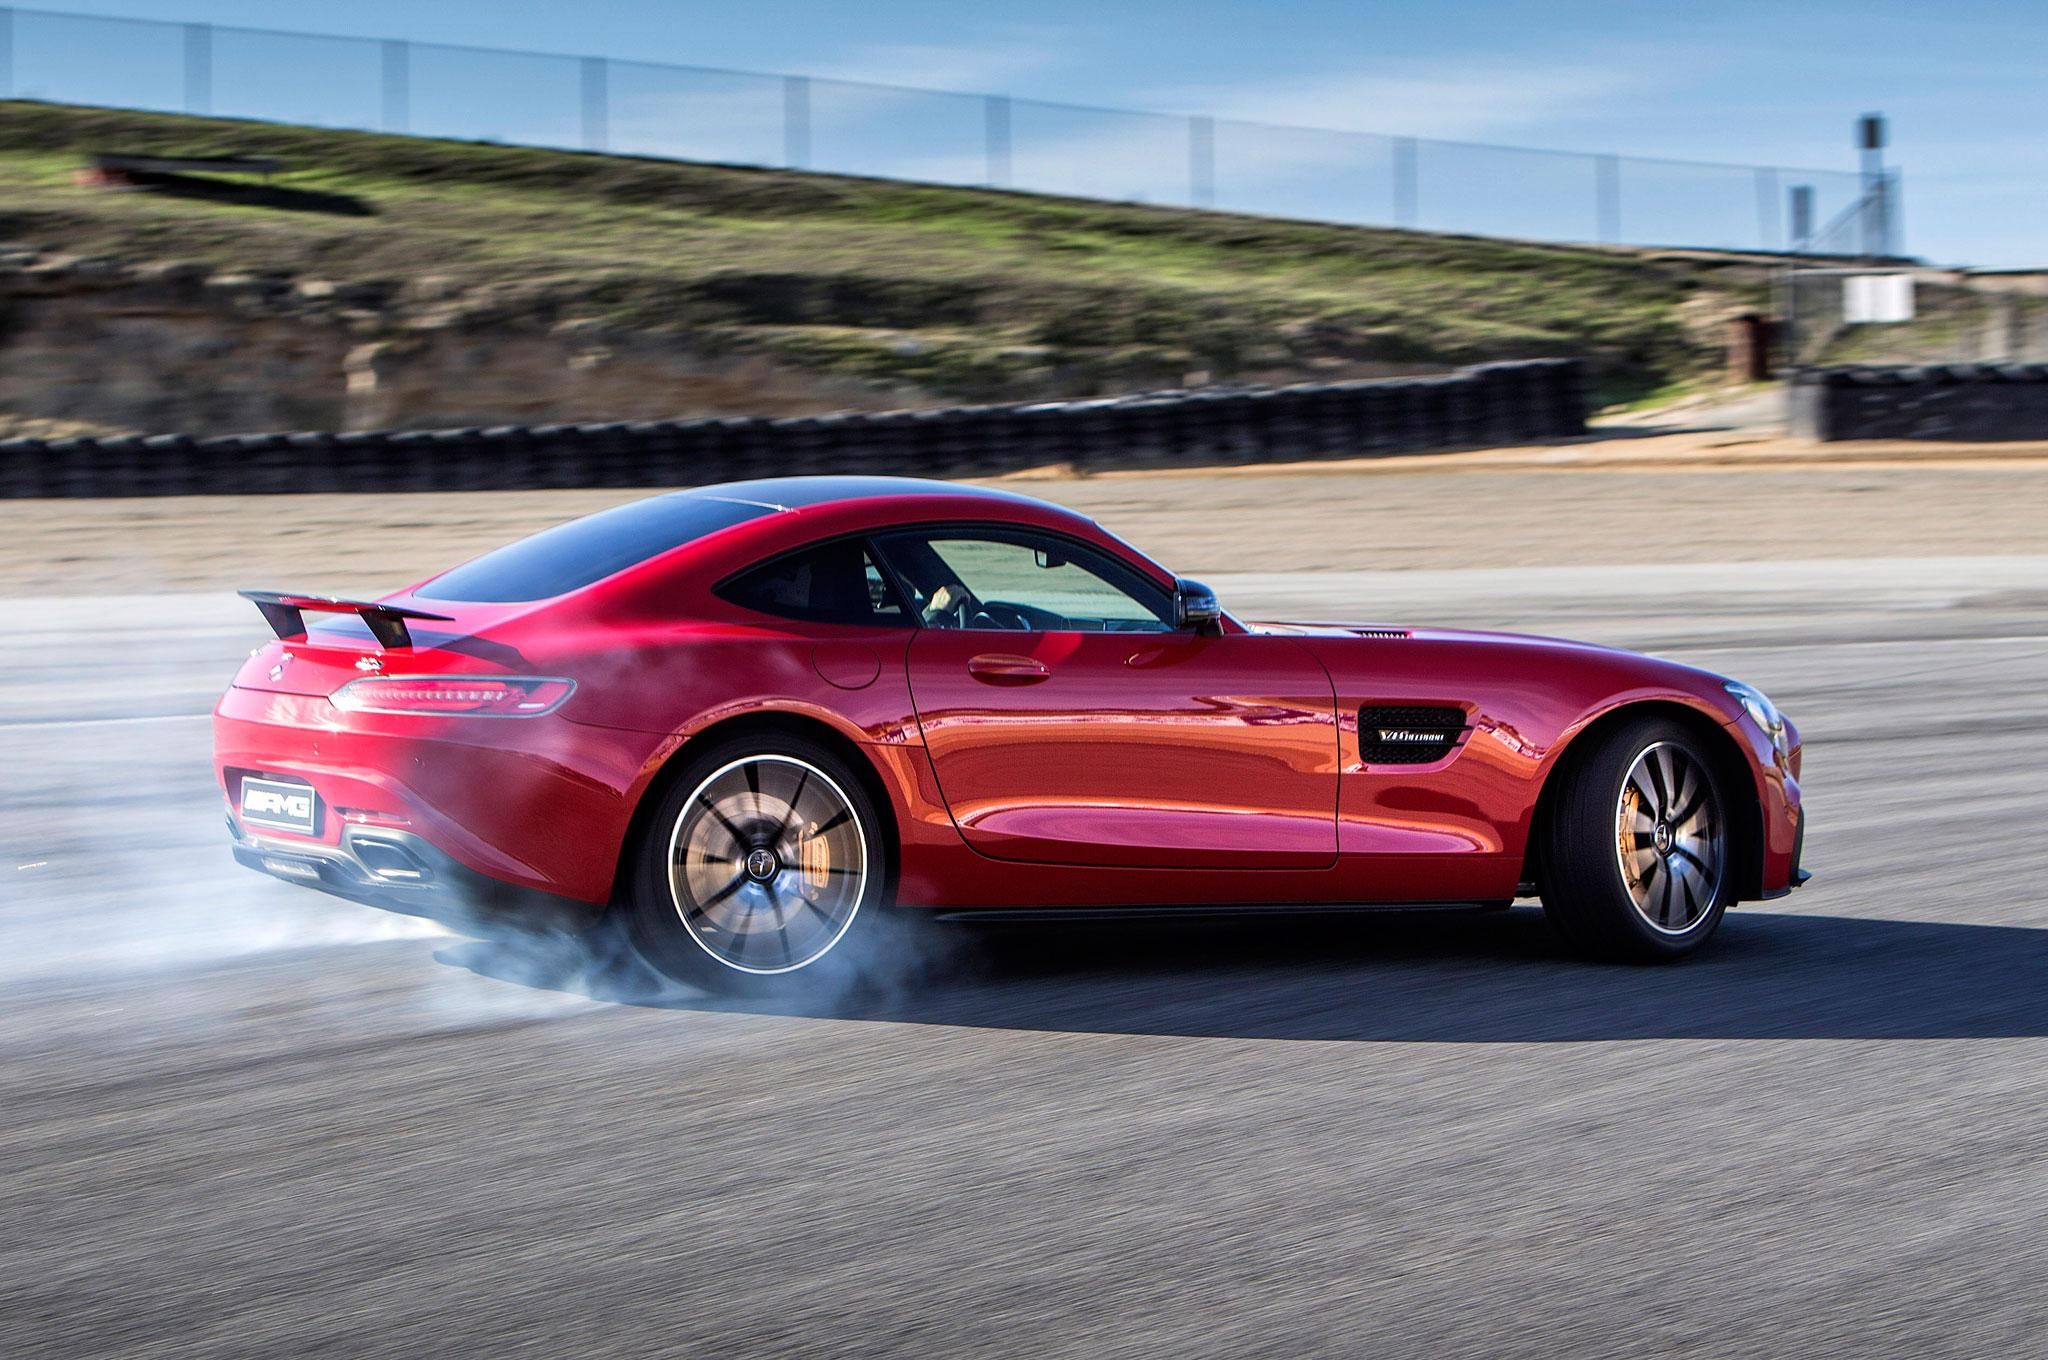 https://st.automobilemag.com/uploads/sites/11/2015/09/2016-Mercedes-AMG-GT-S-Edition-1-rear-passenger-profile-tire-burnout.jpg